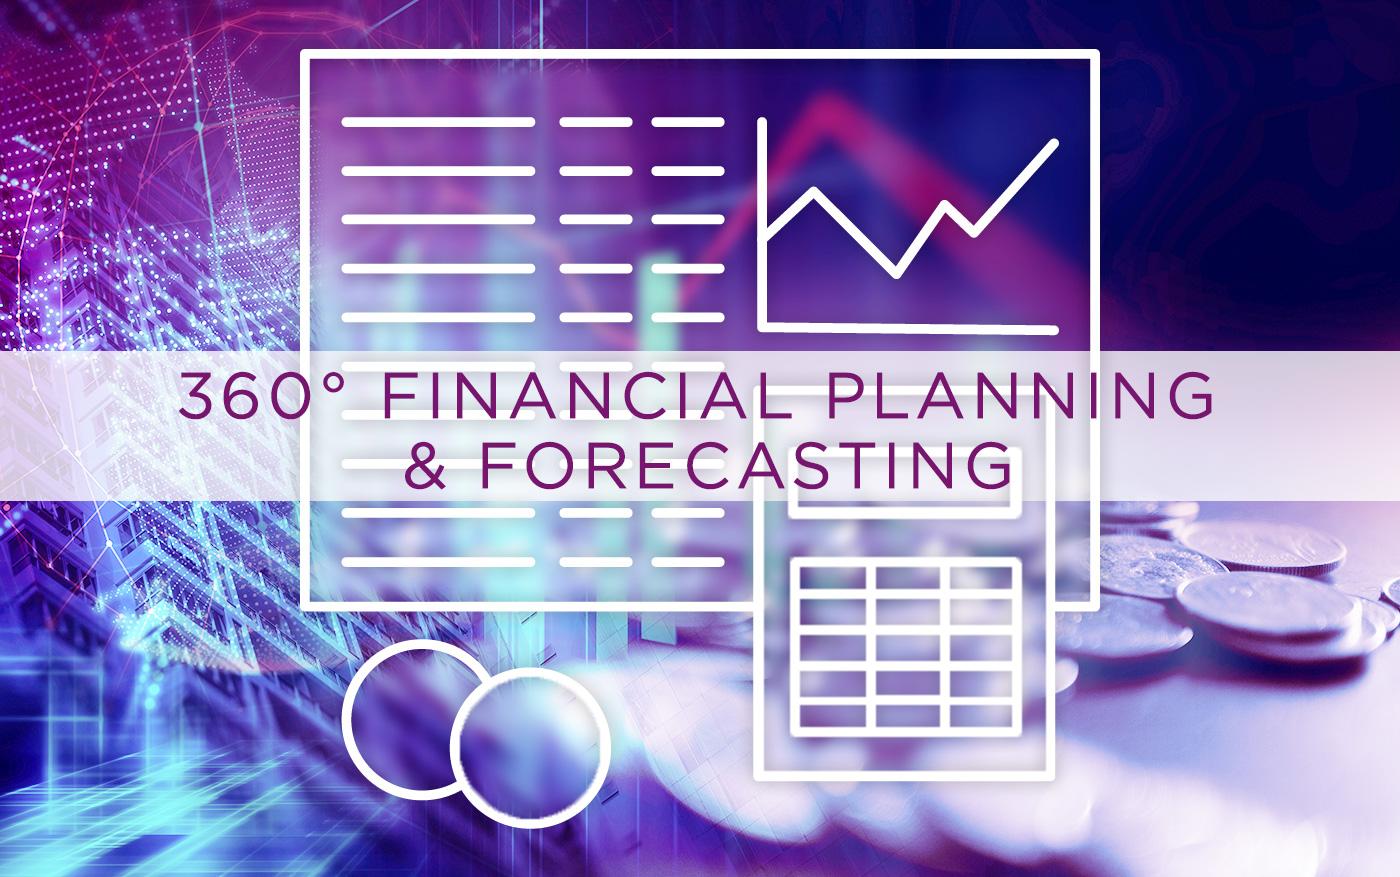 Climber 360 Financial Planning & Forecasting